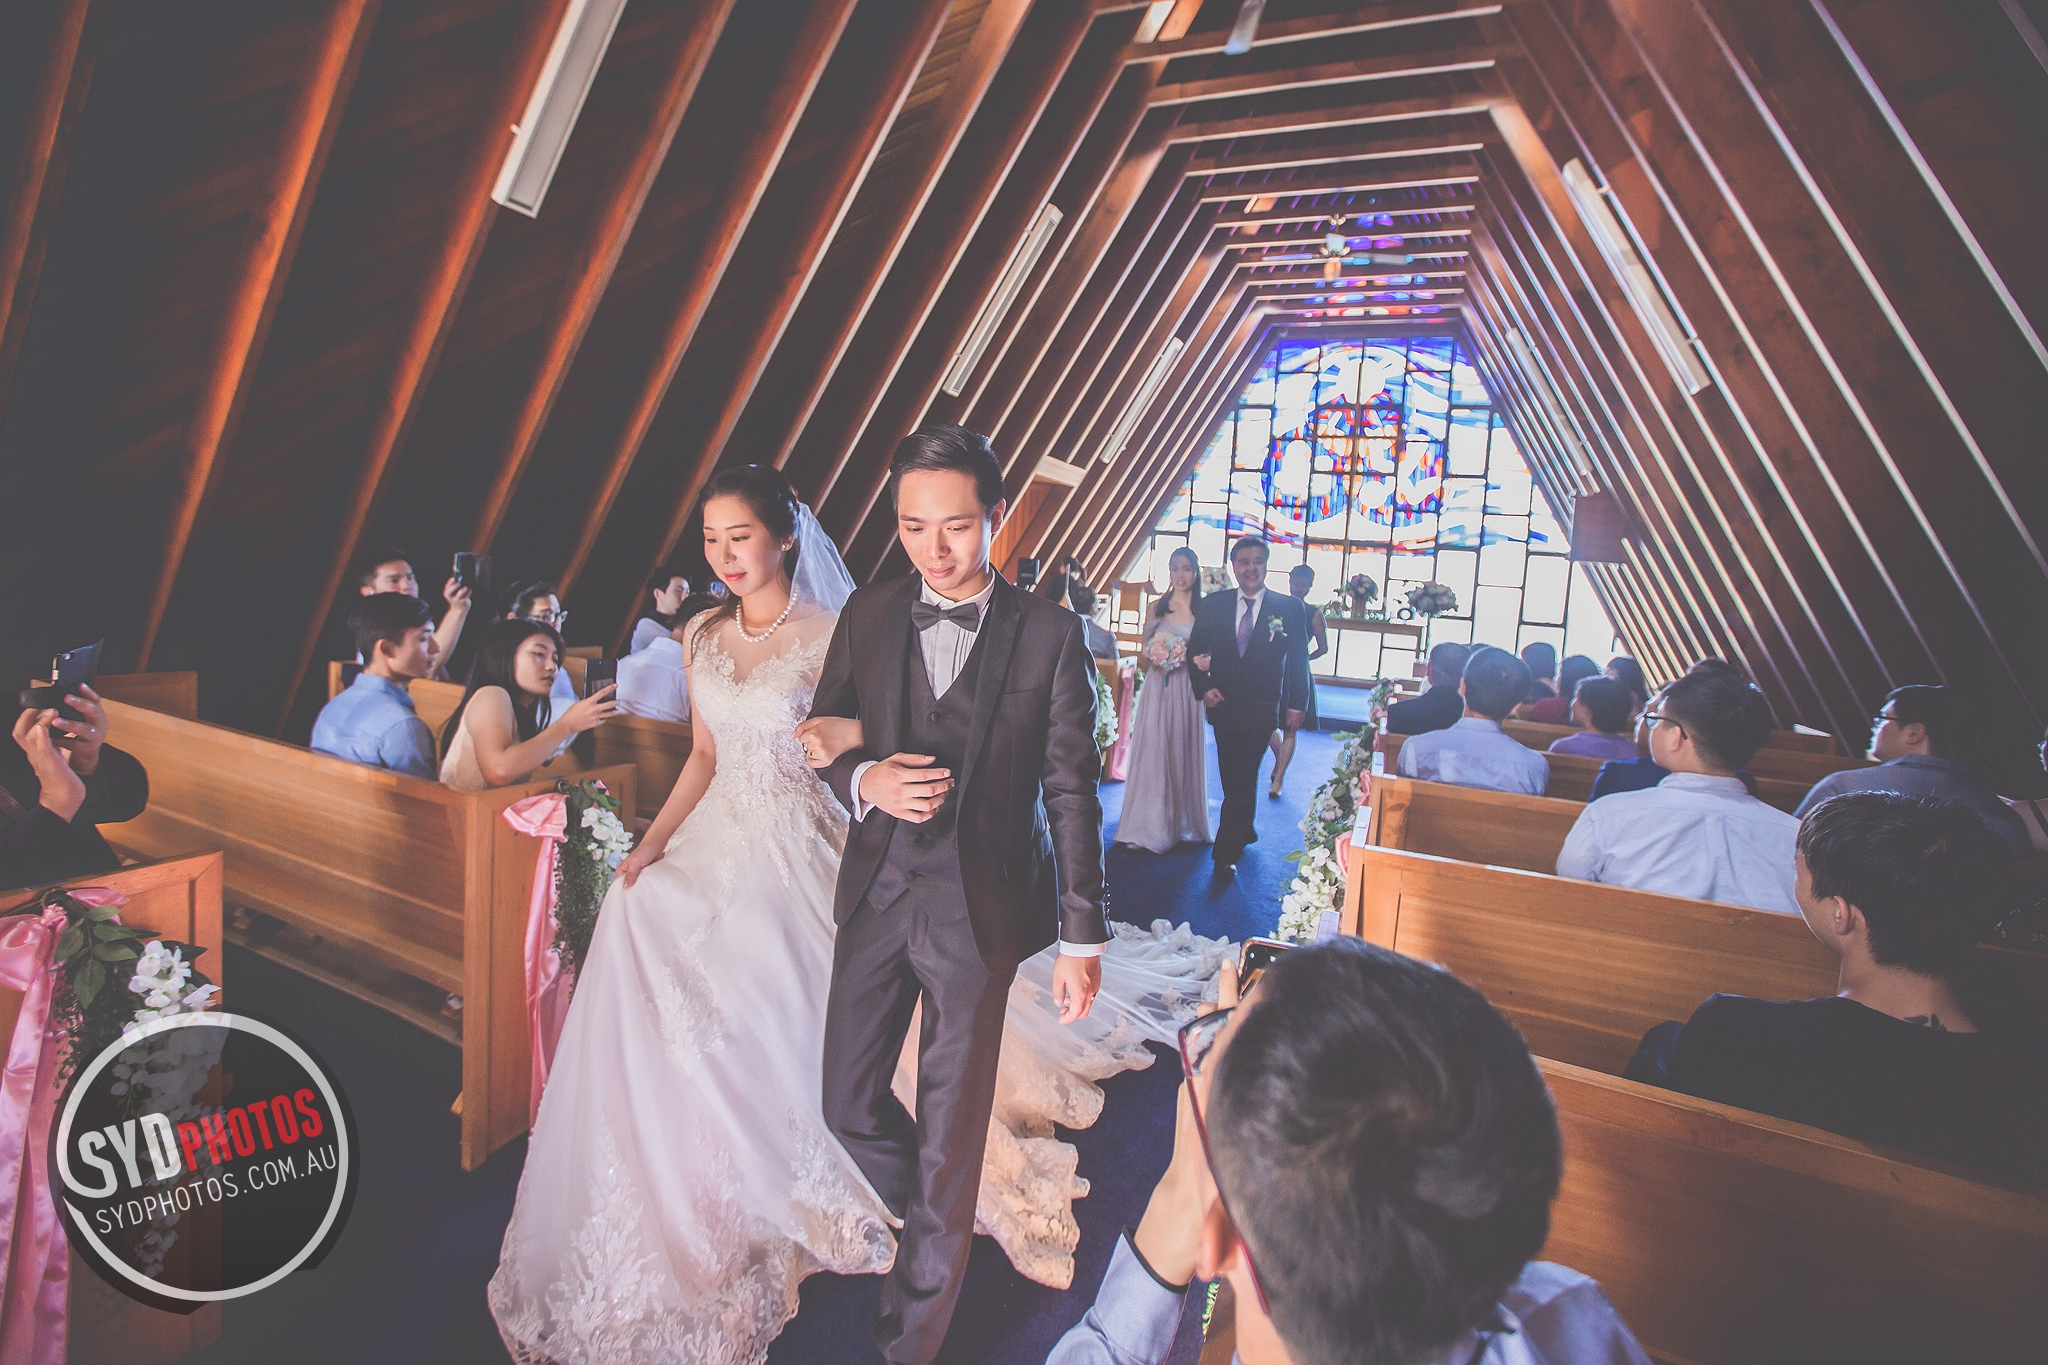 ID-106081-kary-Wedding-悉尼婚礼摄影